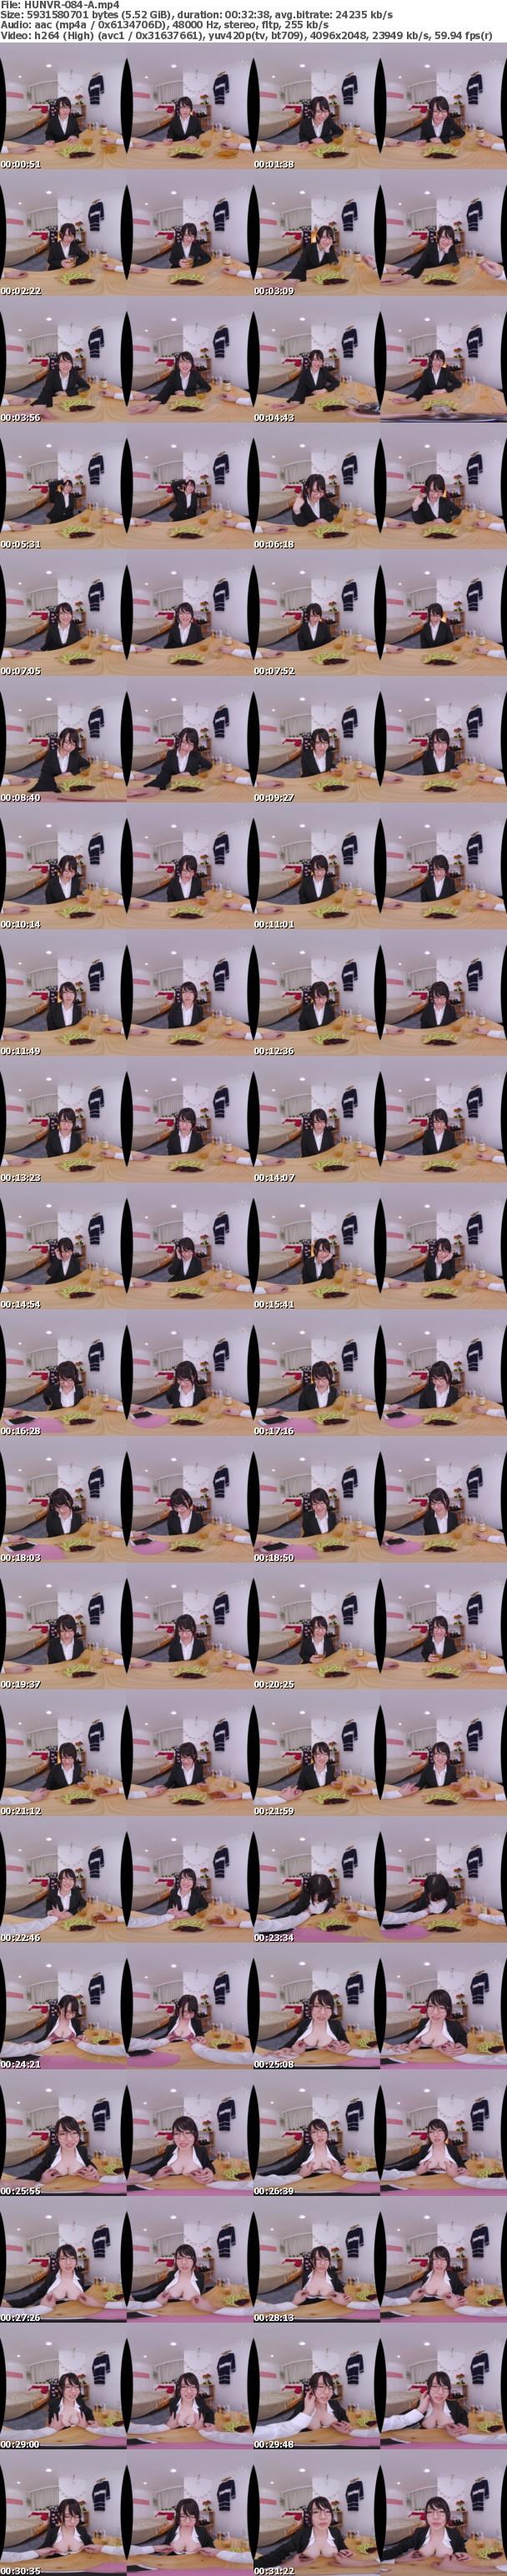 (VR) HUNVR-084 【新アングル革命】究極の覆いかぶさり正常位床特化型VR超地味系メガネ巨乳ギャップ系ヤリマンビッチの後輩OLとヤリまくり!